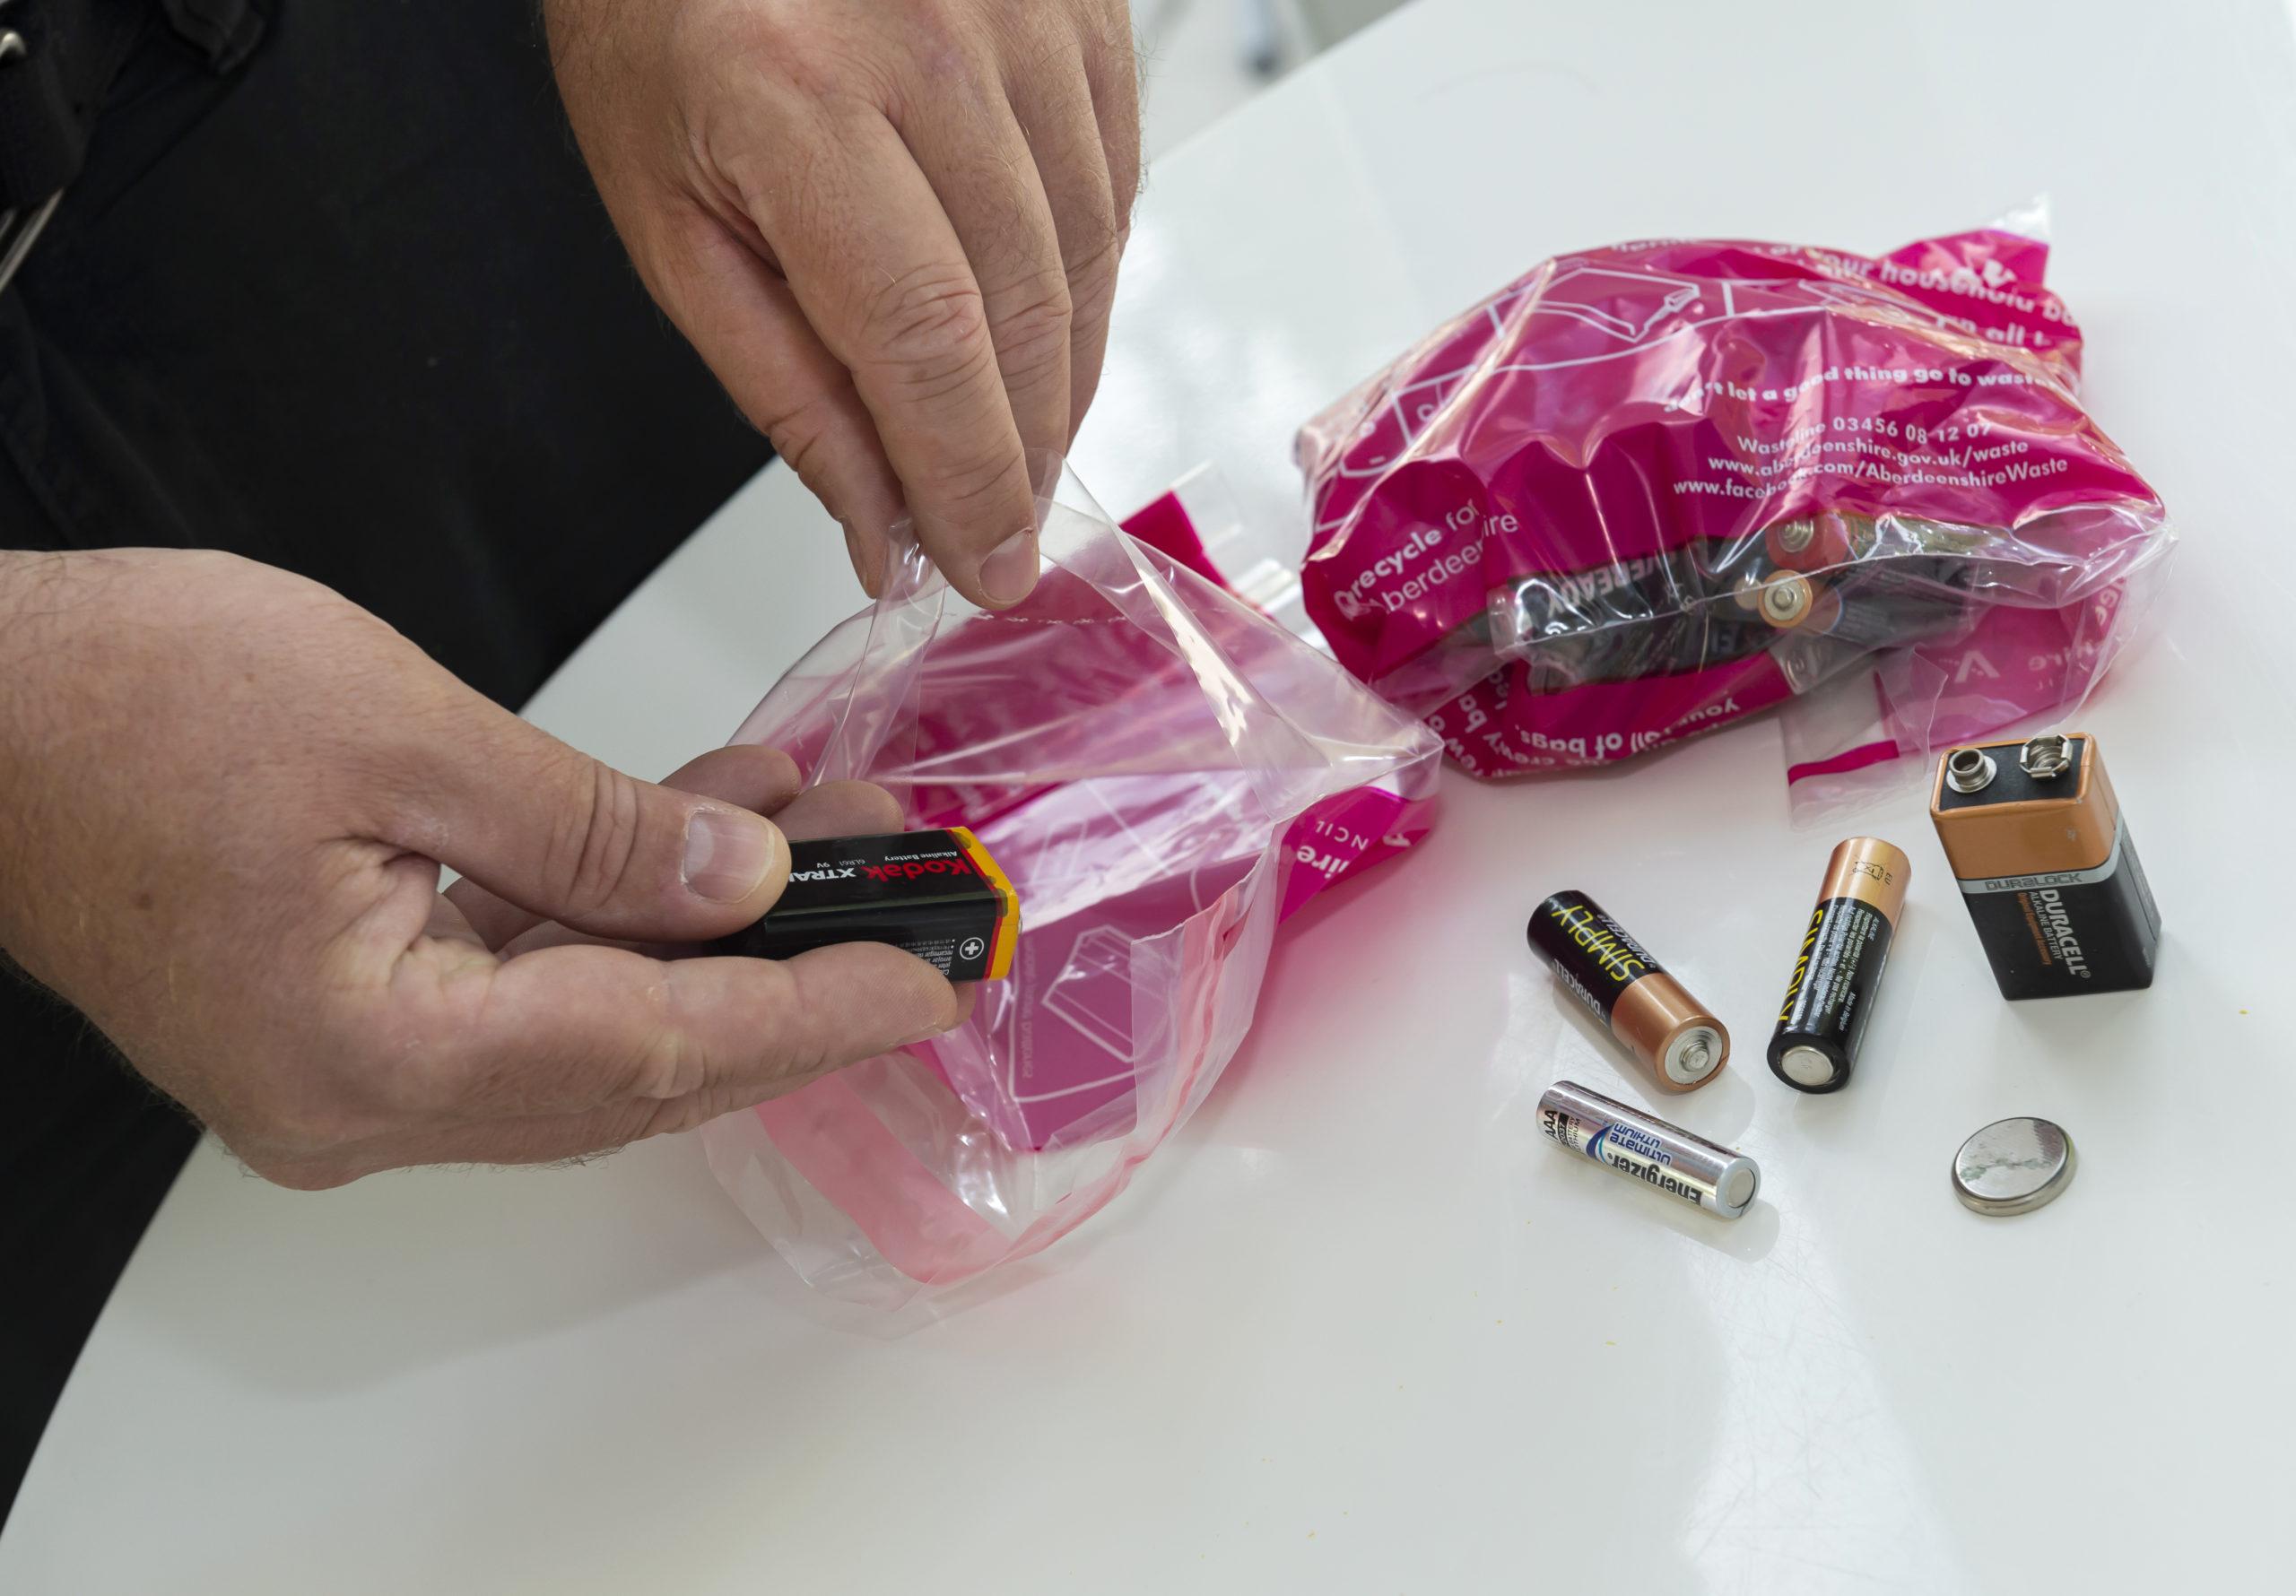 Generic photograph of batteries